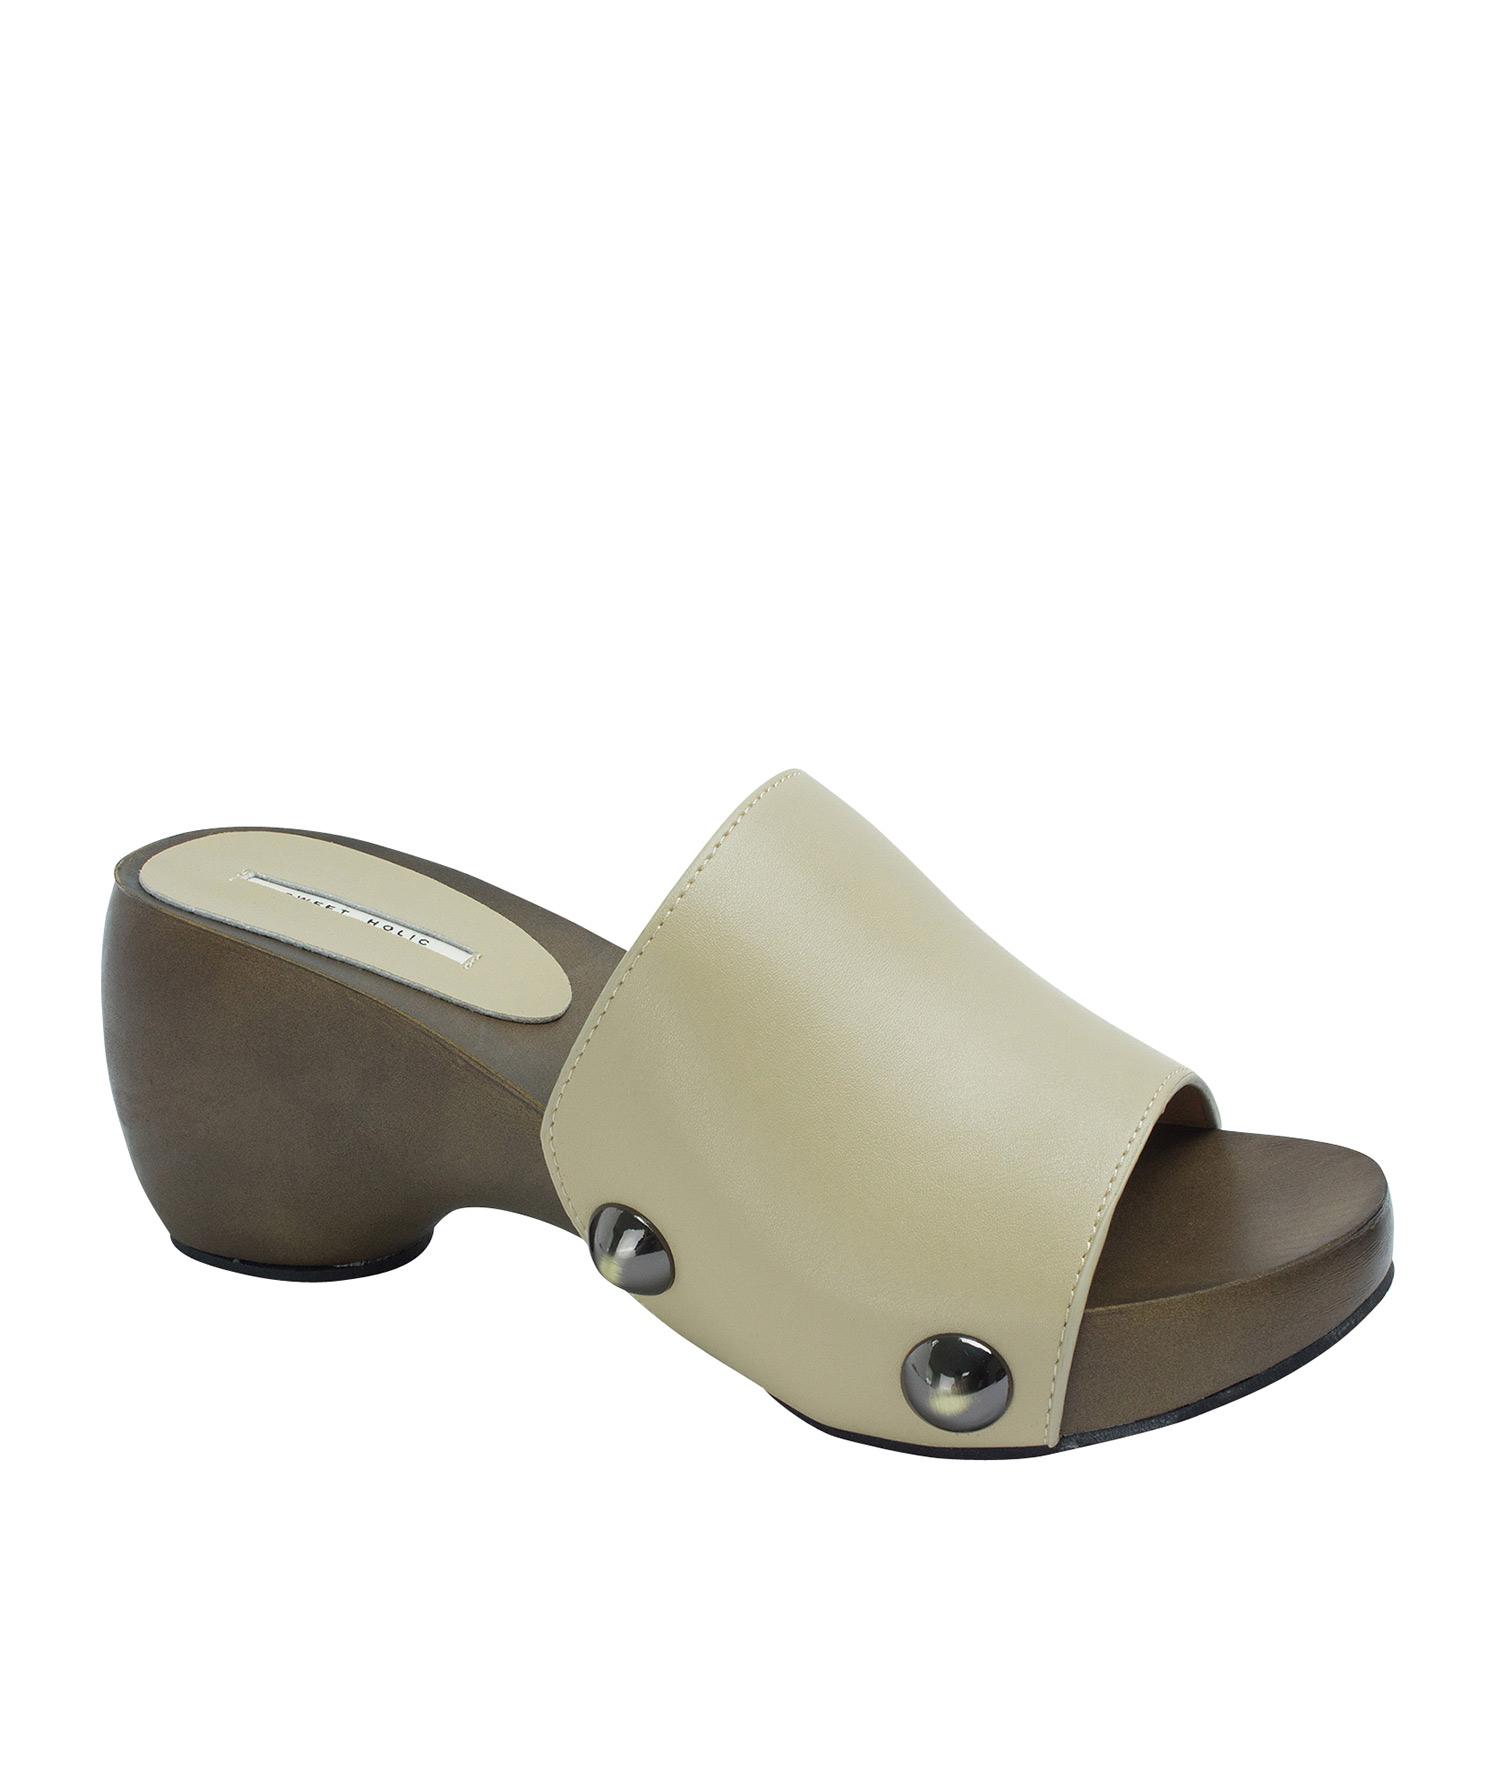 77eeb7bdb12 AnnaKastle Womens Bold Studded Platform Clog Sandals Beige